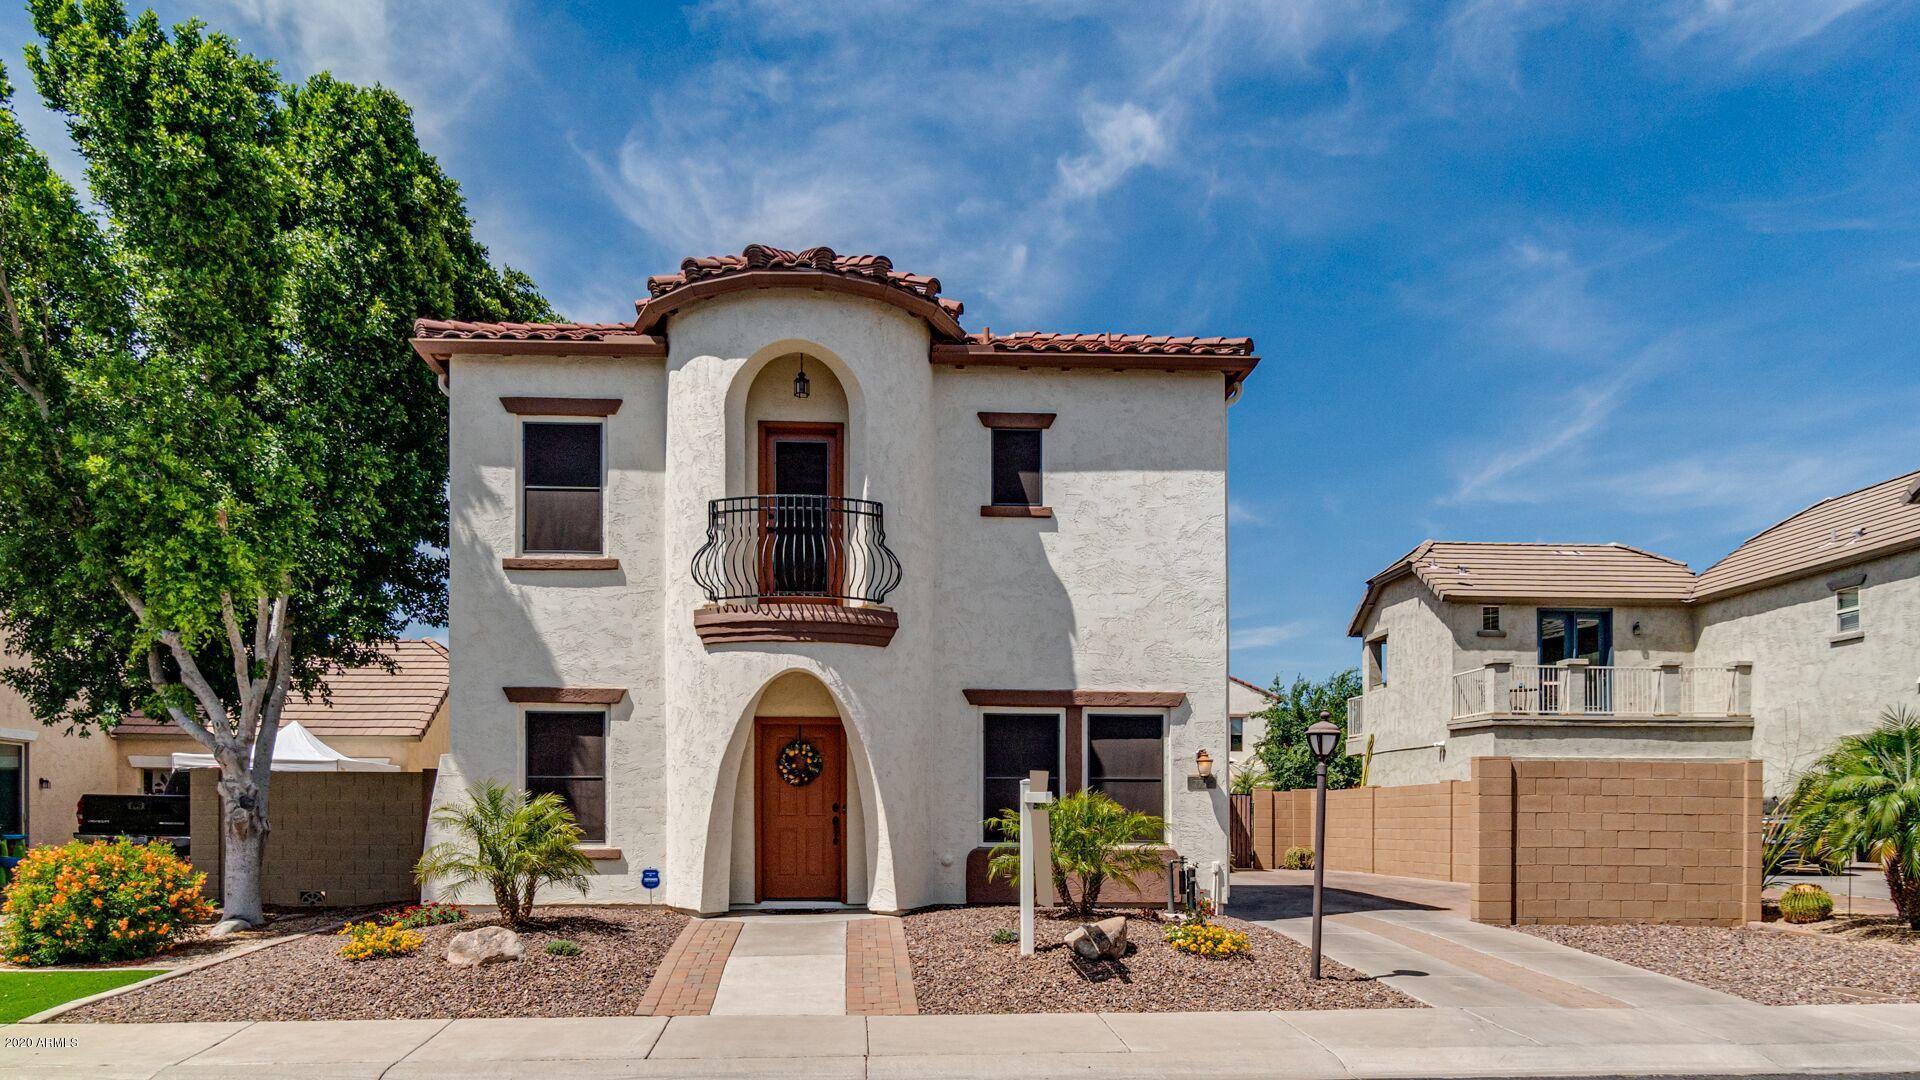 Photo of 7738 E ALBANY Street E, Mesa, AZ 85207